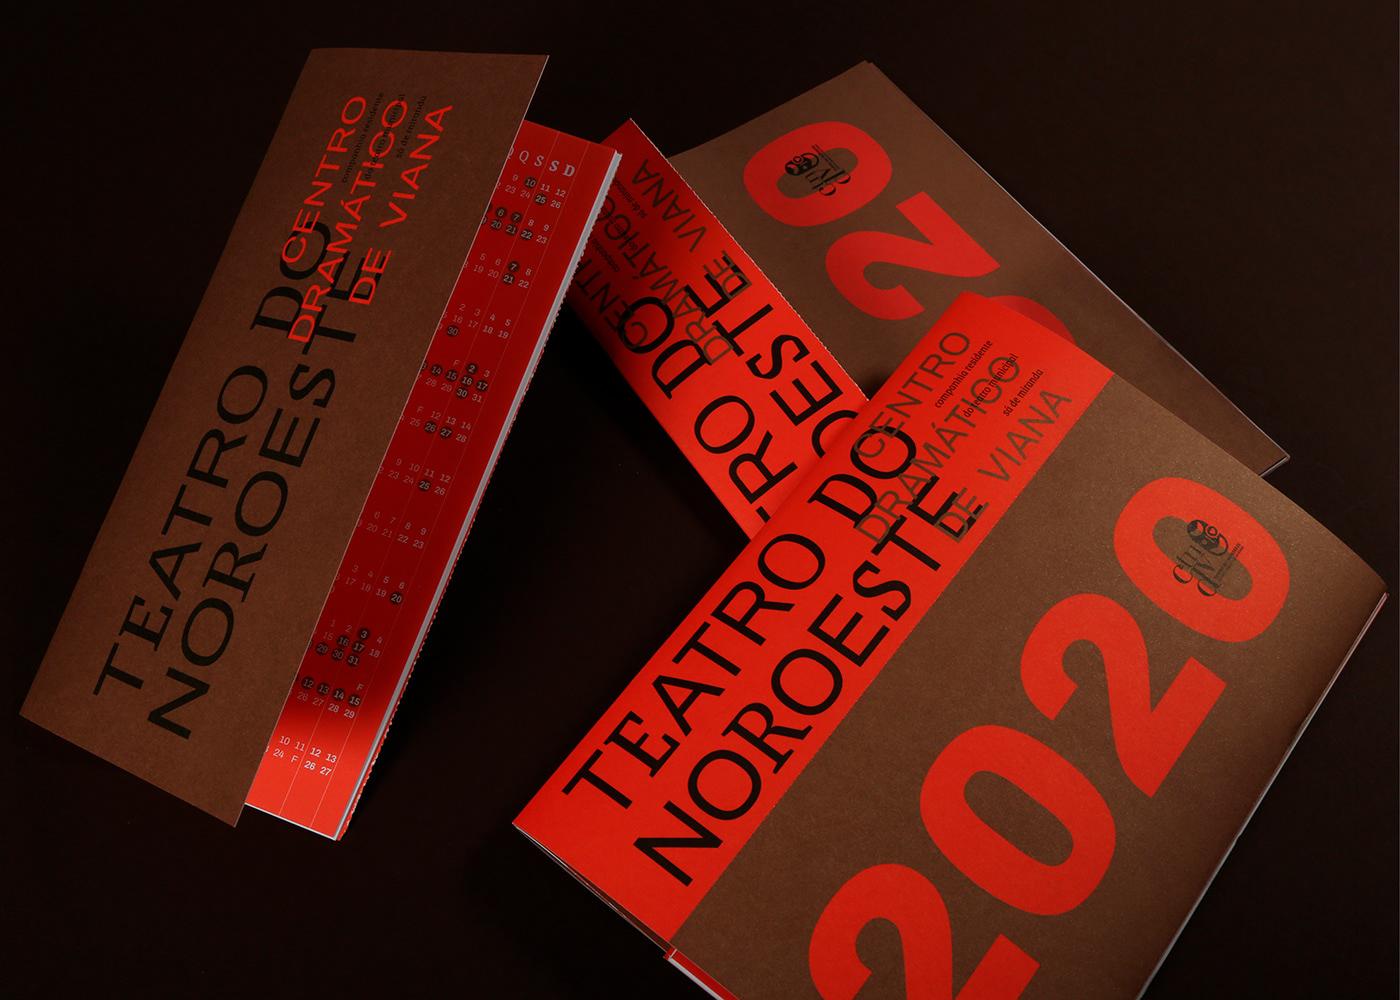 centrodramaticodeviana design editorial graphic design  teatrodonoroeste Theatre